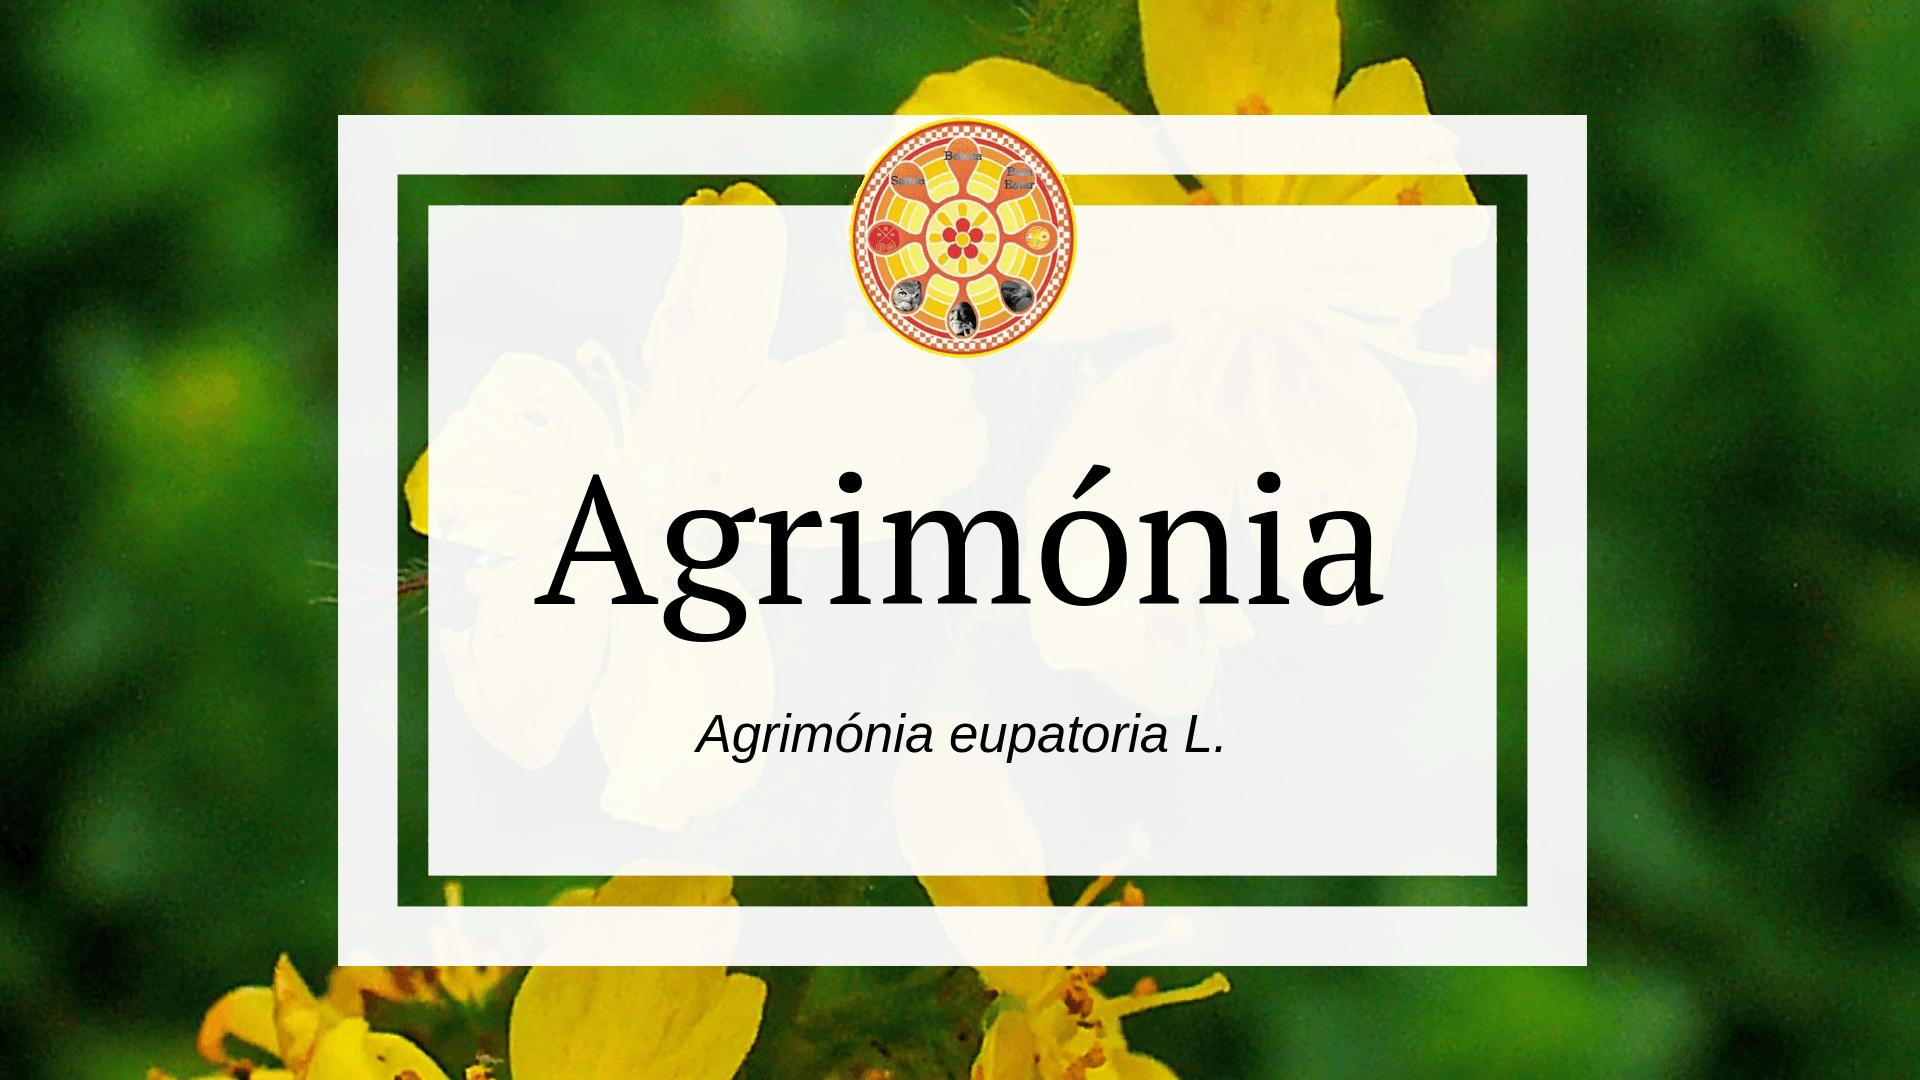 Agrimónia eupatoria L.